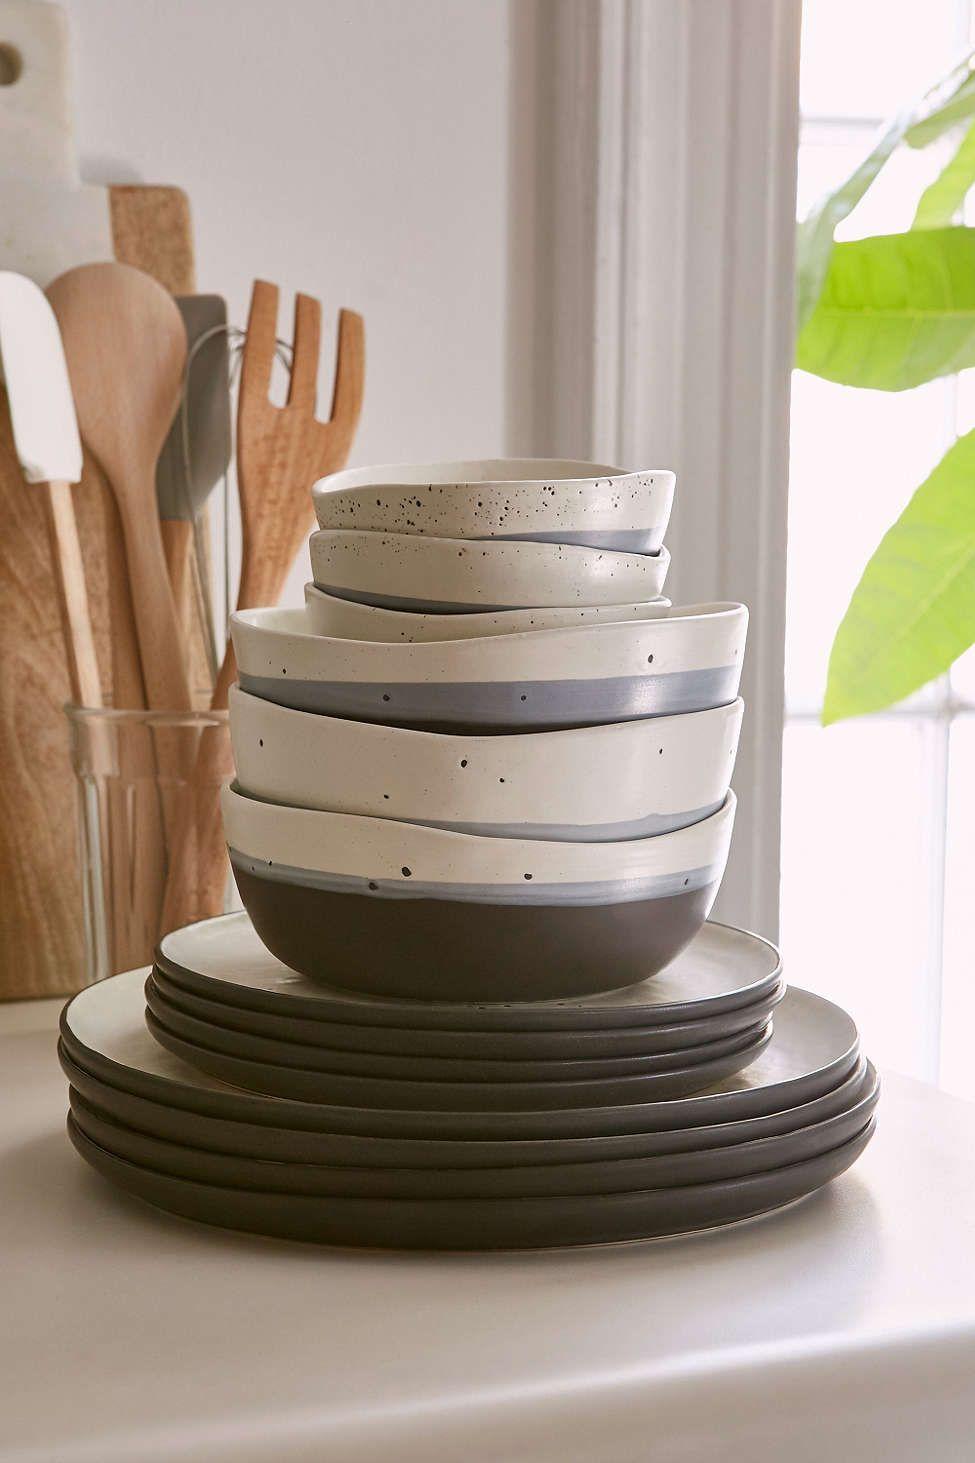 piece dinner set  dinnerware  dinnerware set  pottery  -  piece dinner set  dinnerware  dinnerware set  pottery dinnerware ceramic dinnerware  dinner sets dinnerware and dinners